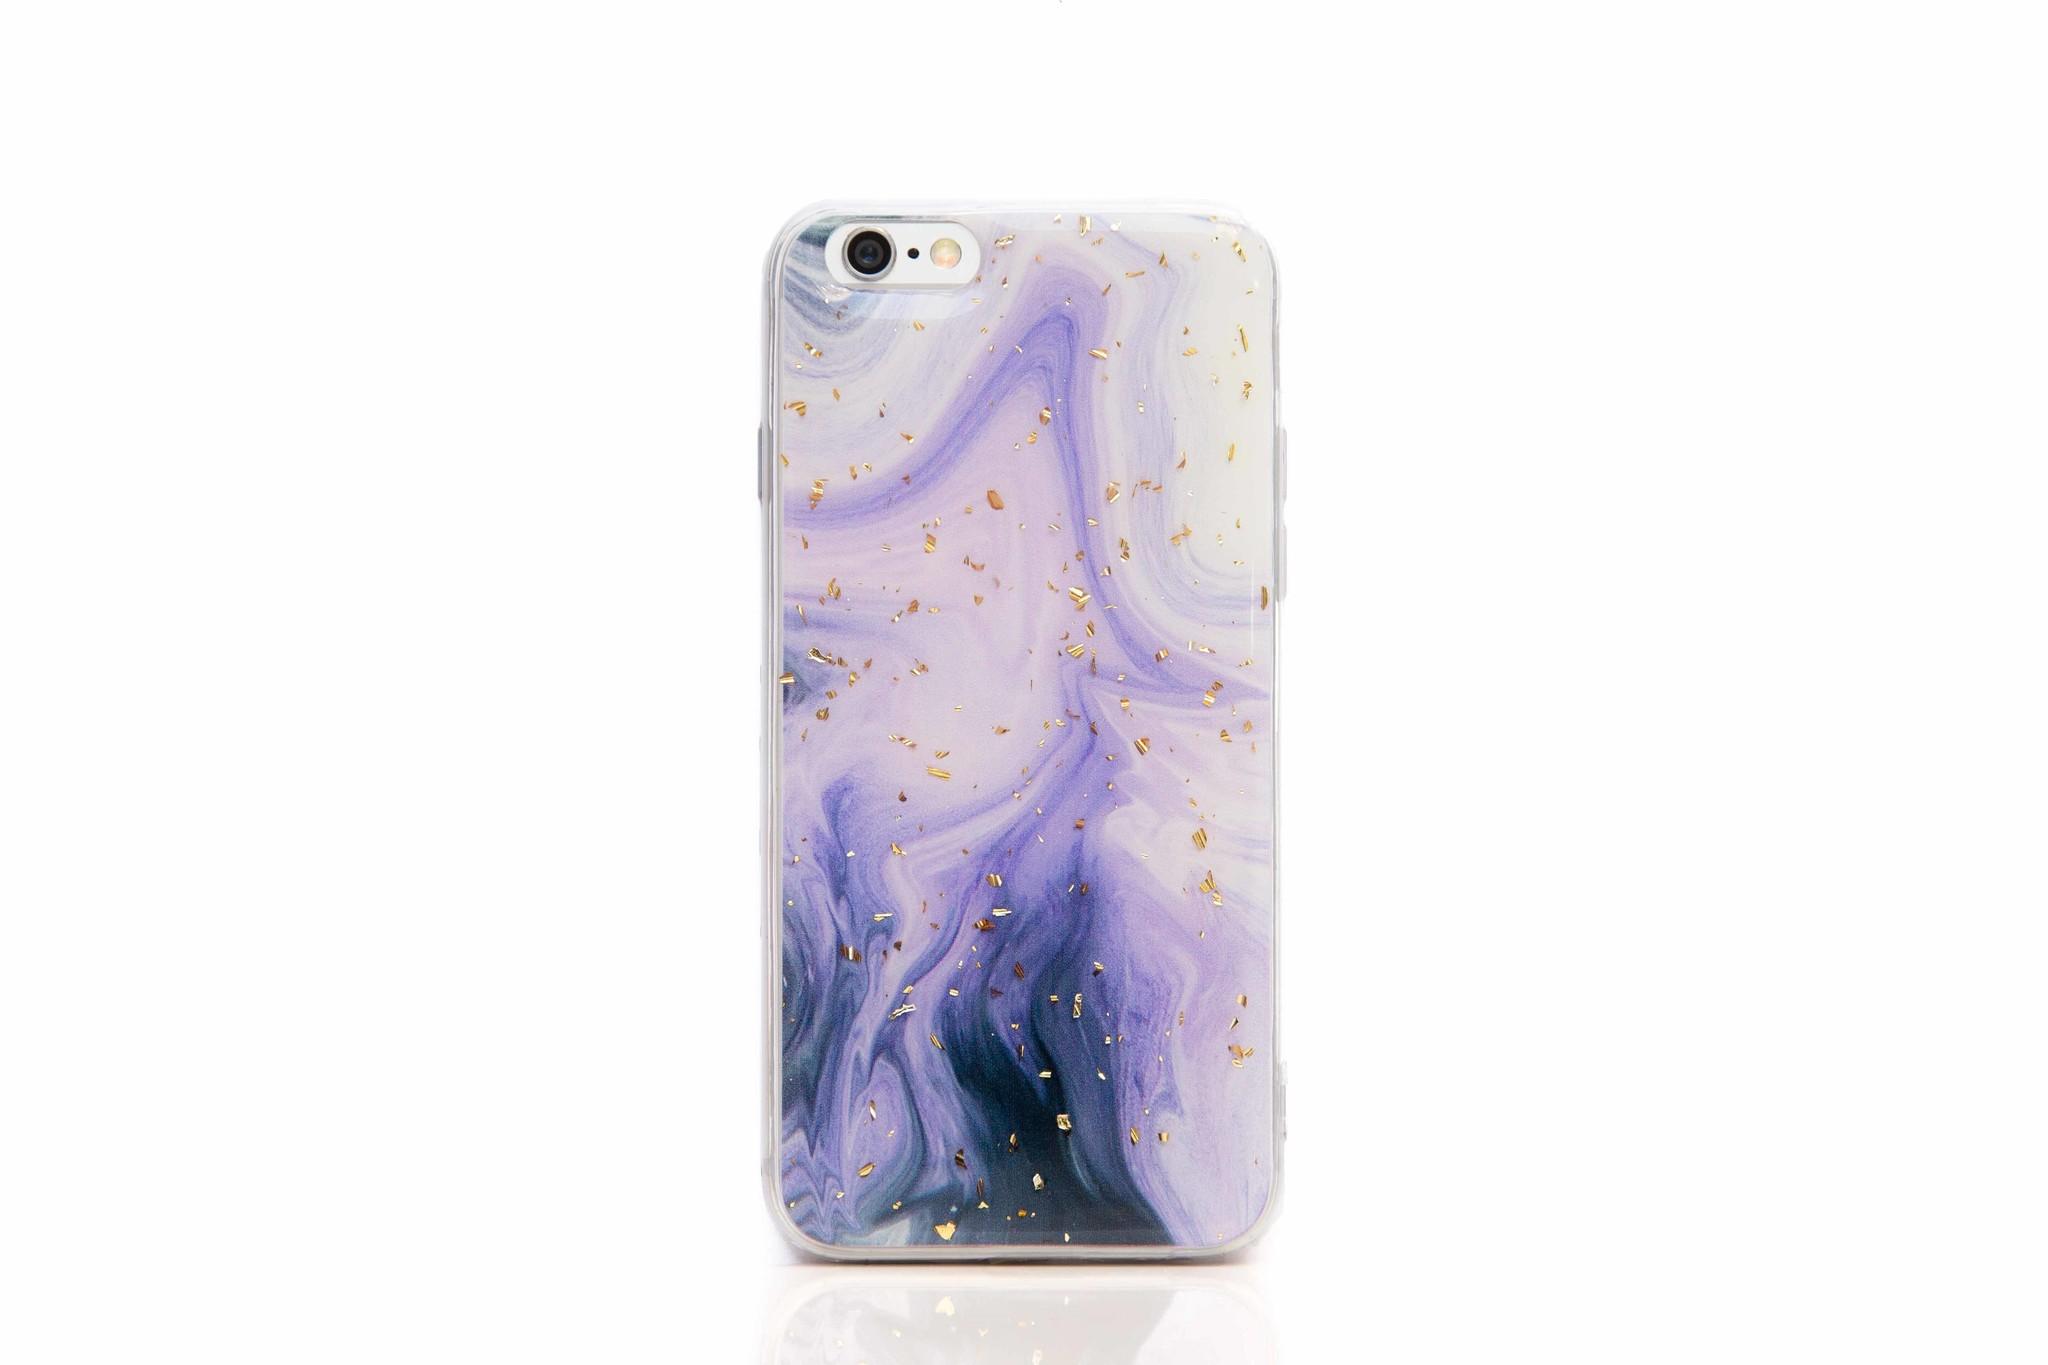 Smartphonehoesje iPhone 6s | Marmerlook (glitter) | Paars / wit